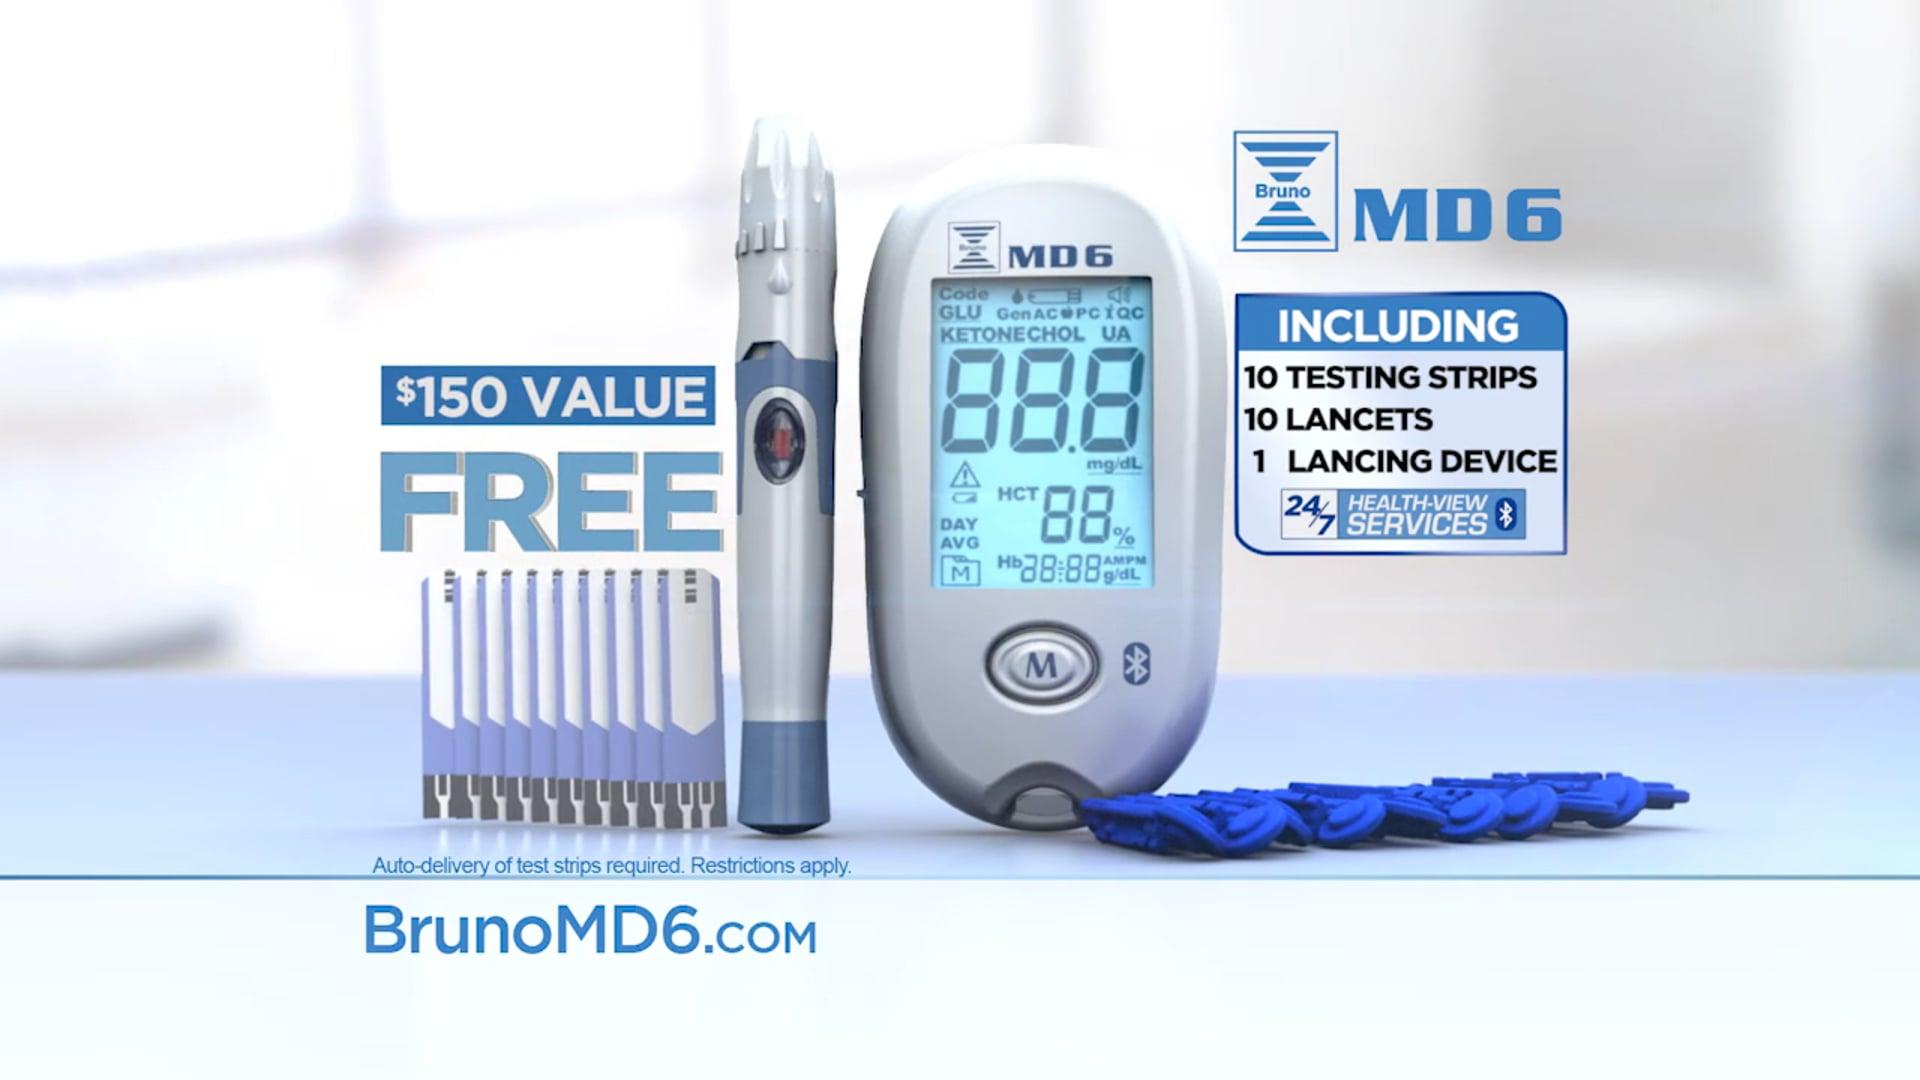 Bruno MD6 Commercial Spot